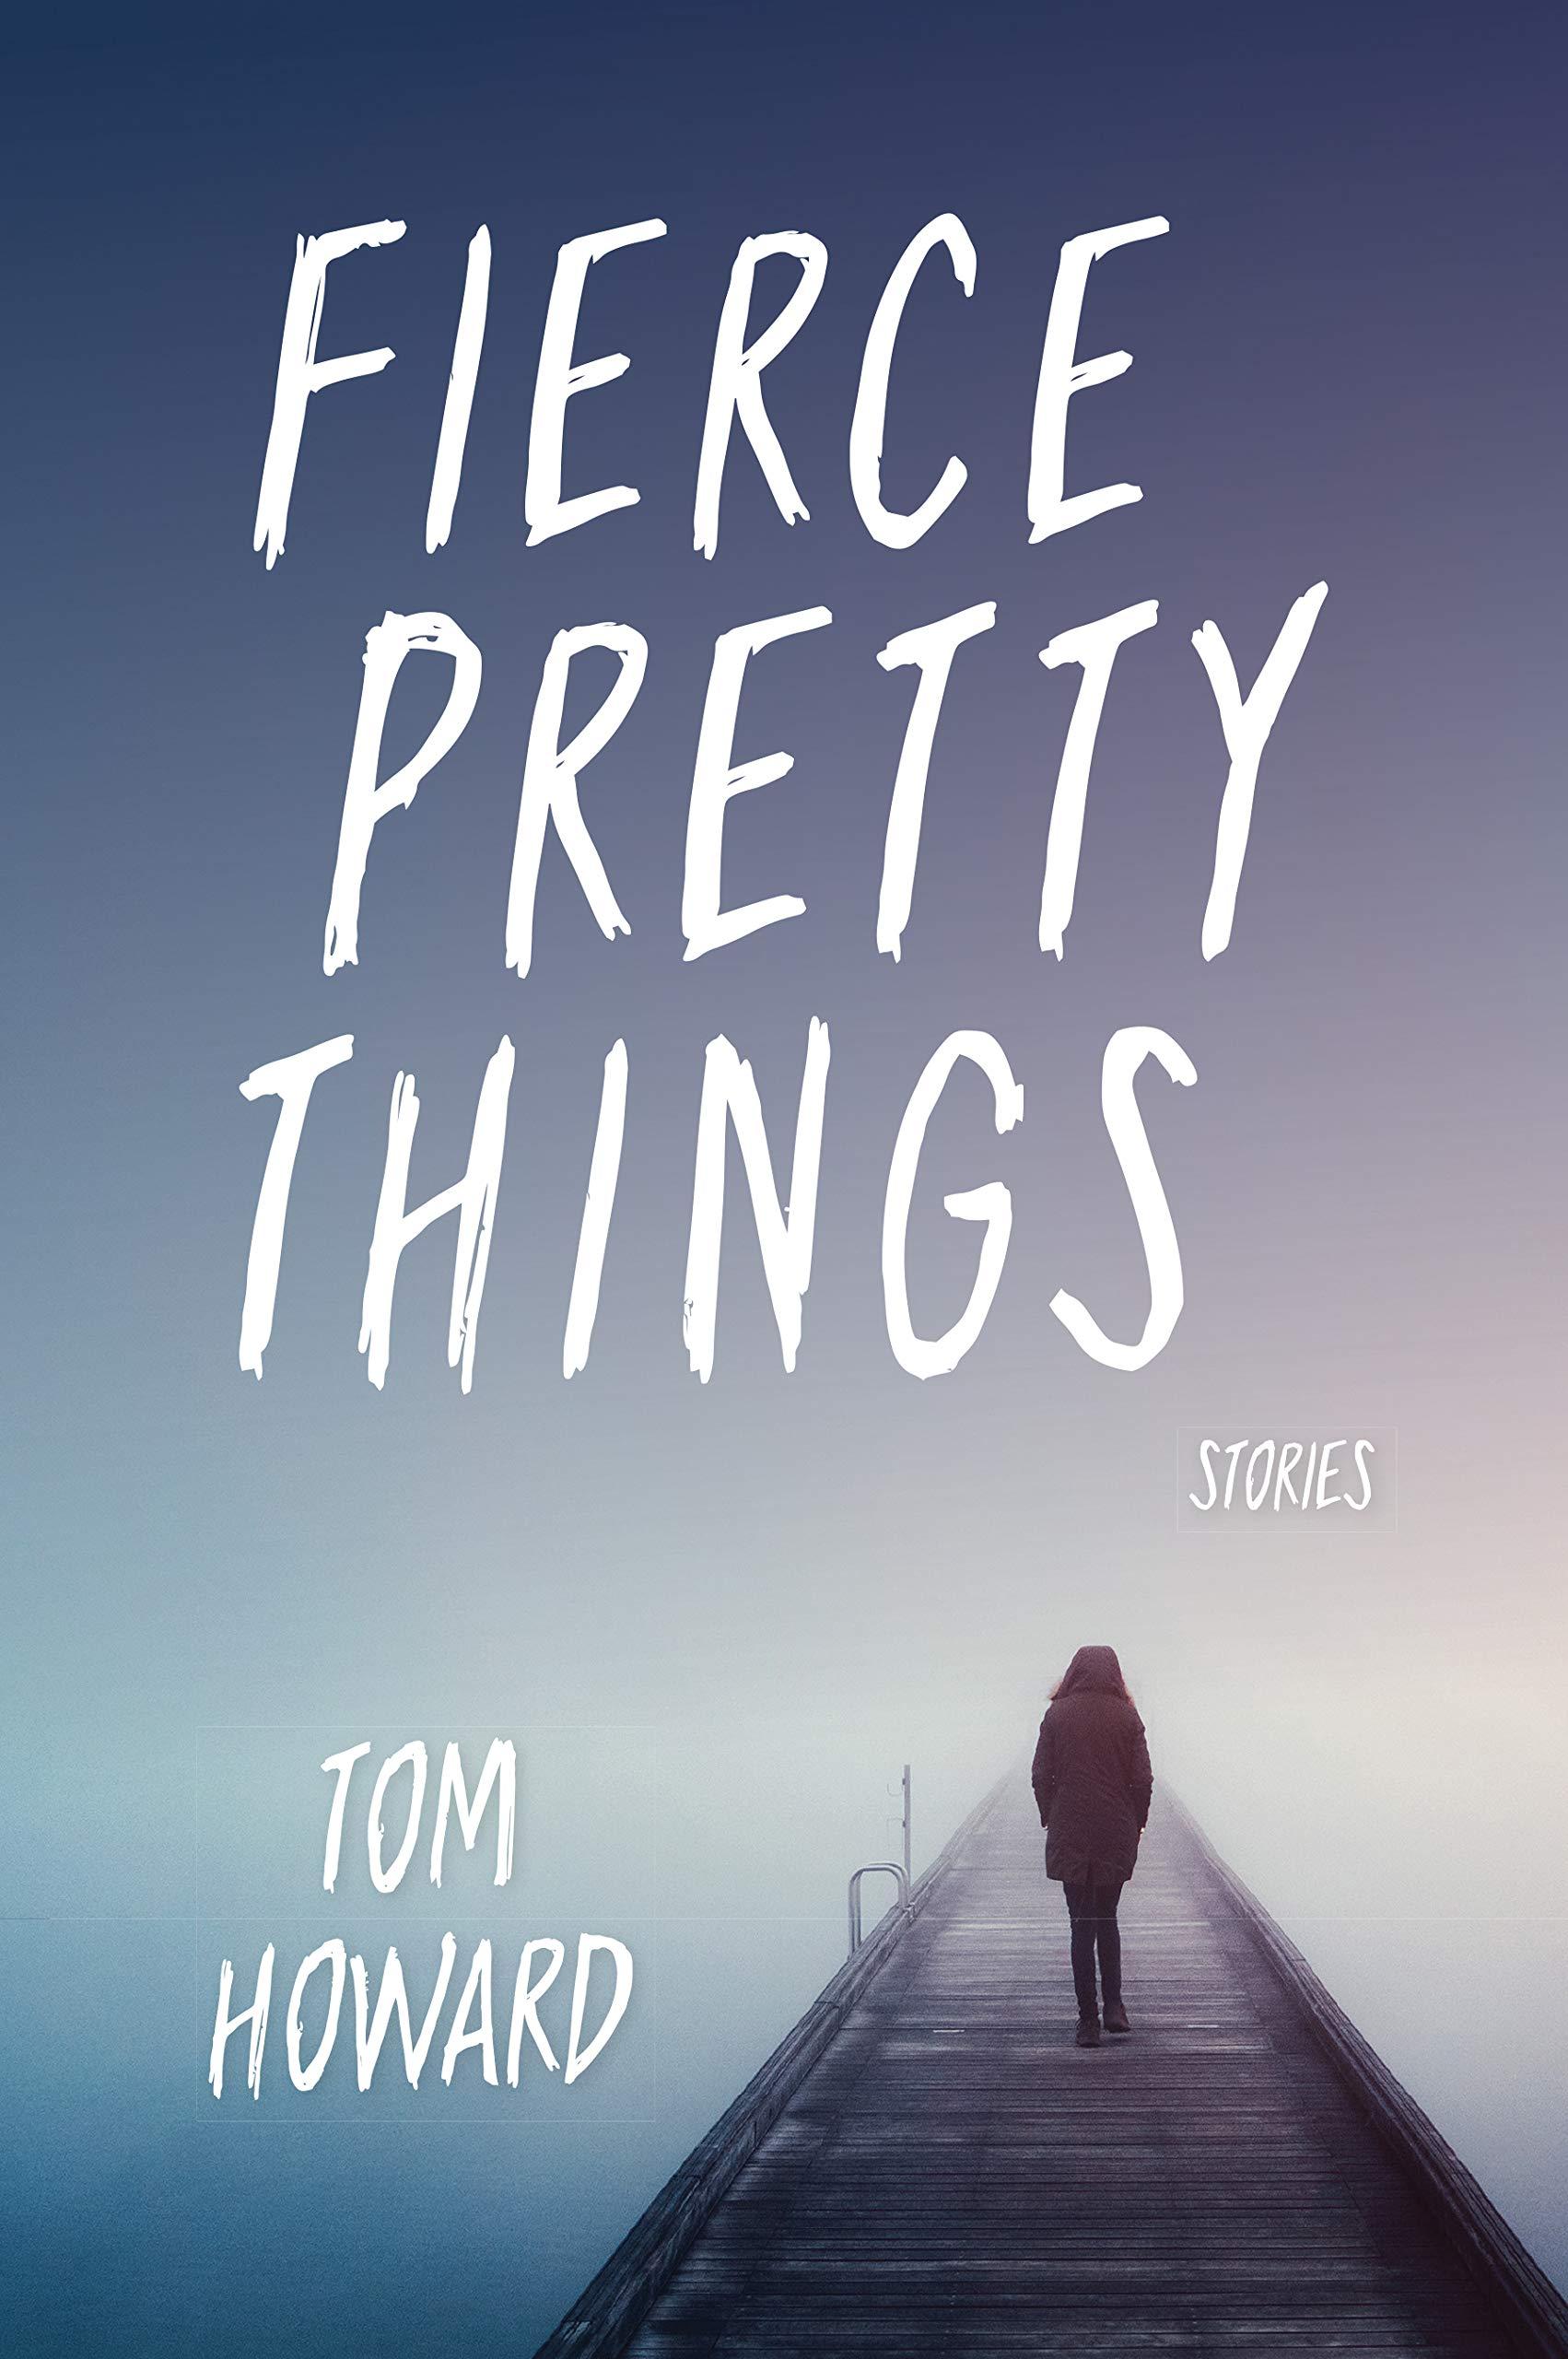 Fierce Pretty Things Stories Blue Light Books Tom Howard